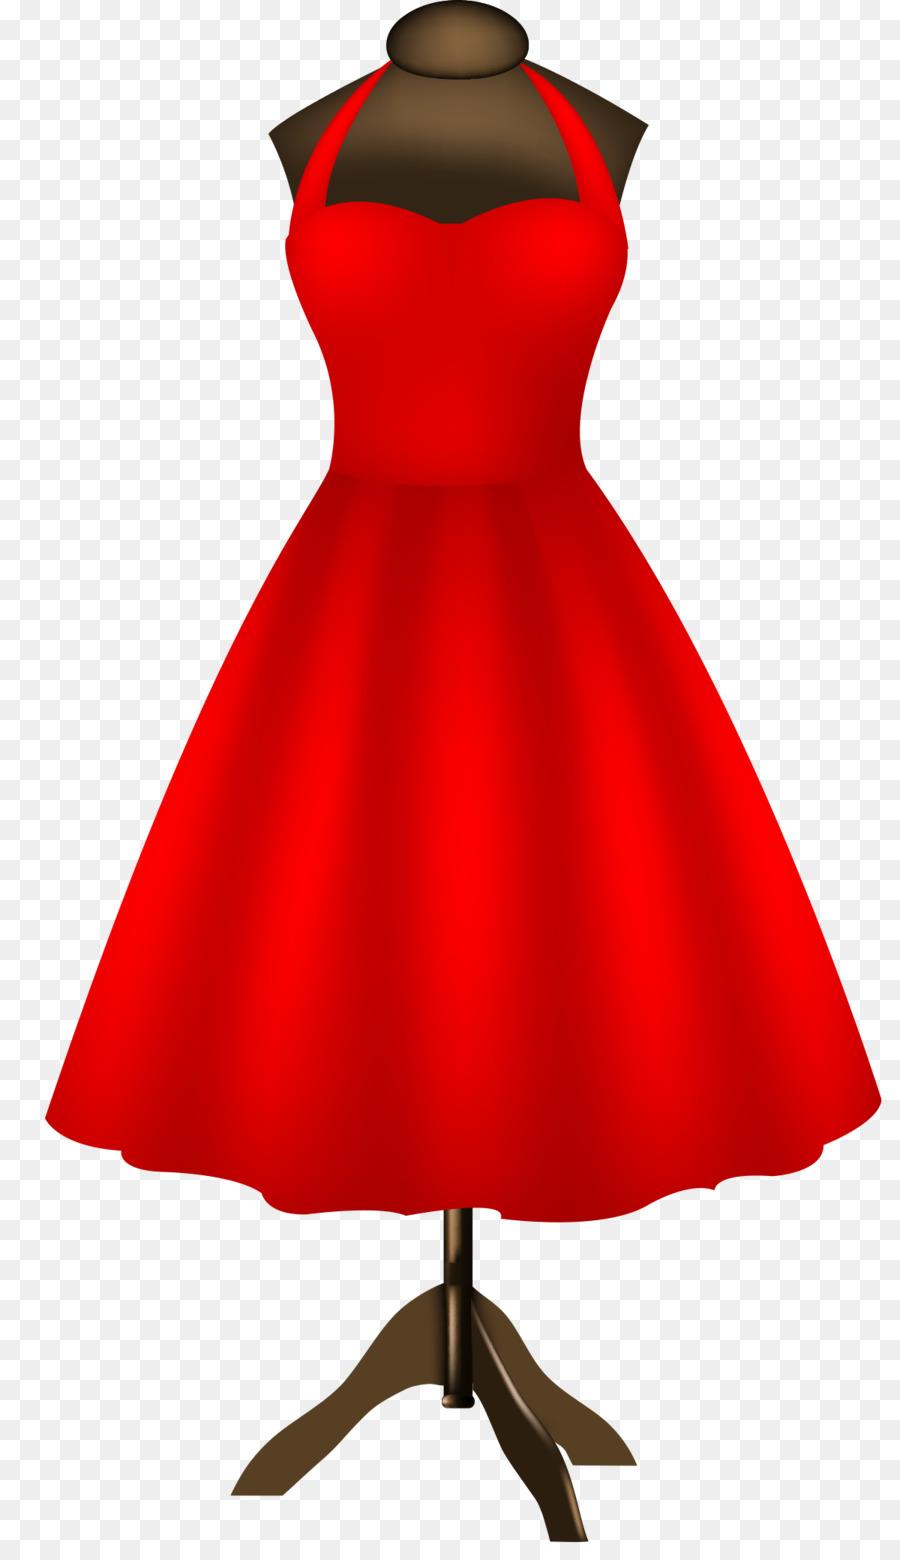 900x1560 Clothing Tailor Skirt